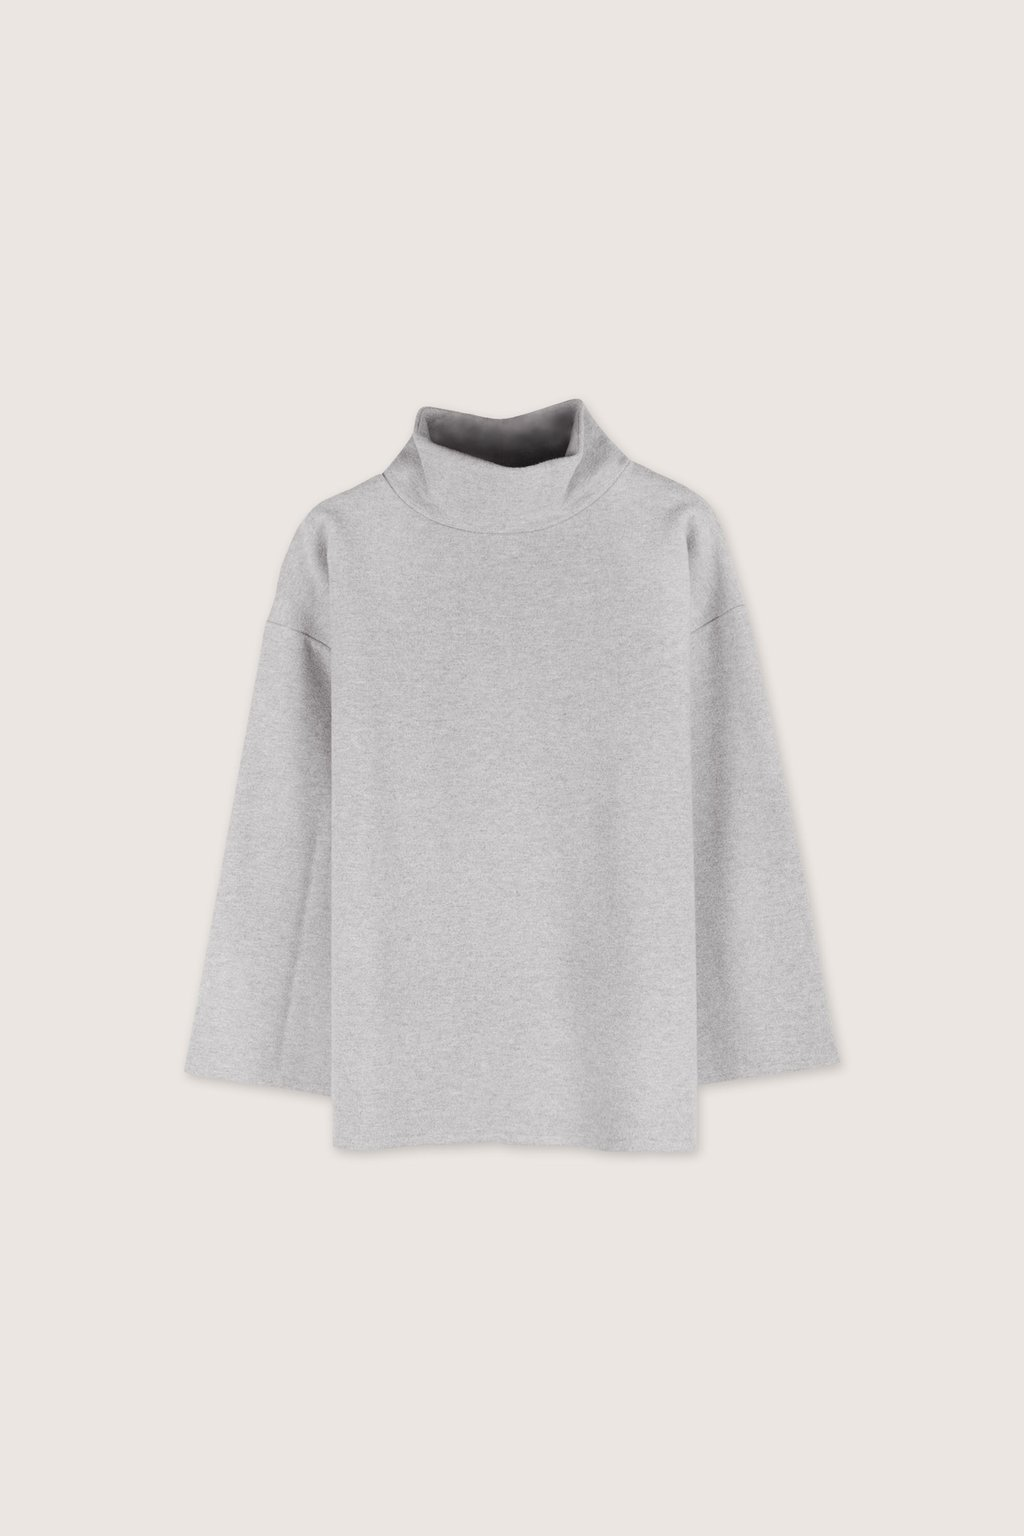 Sweater 1640 Gray 7